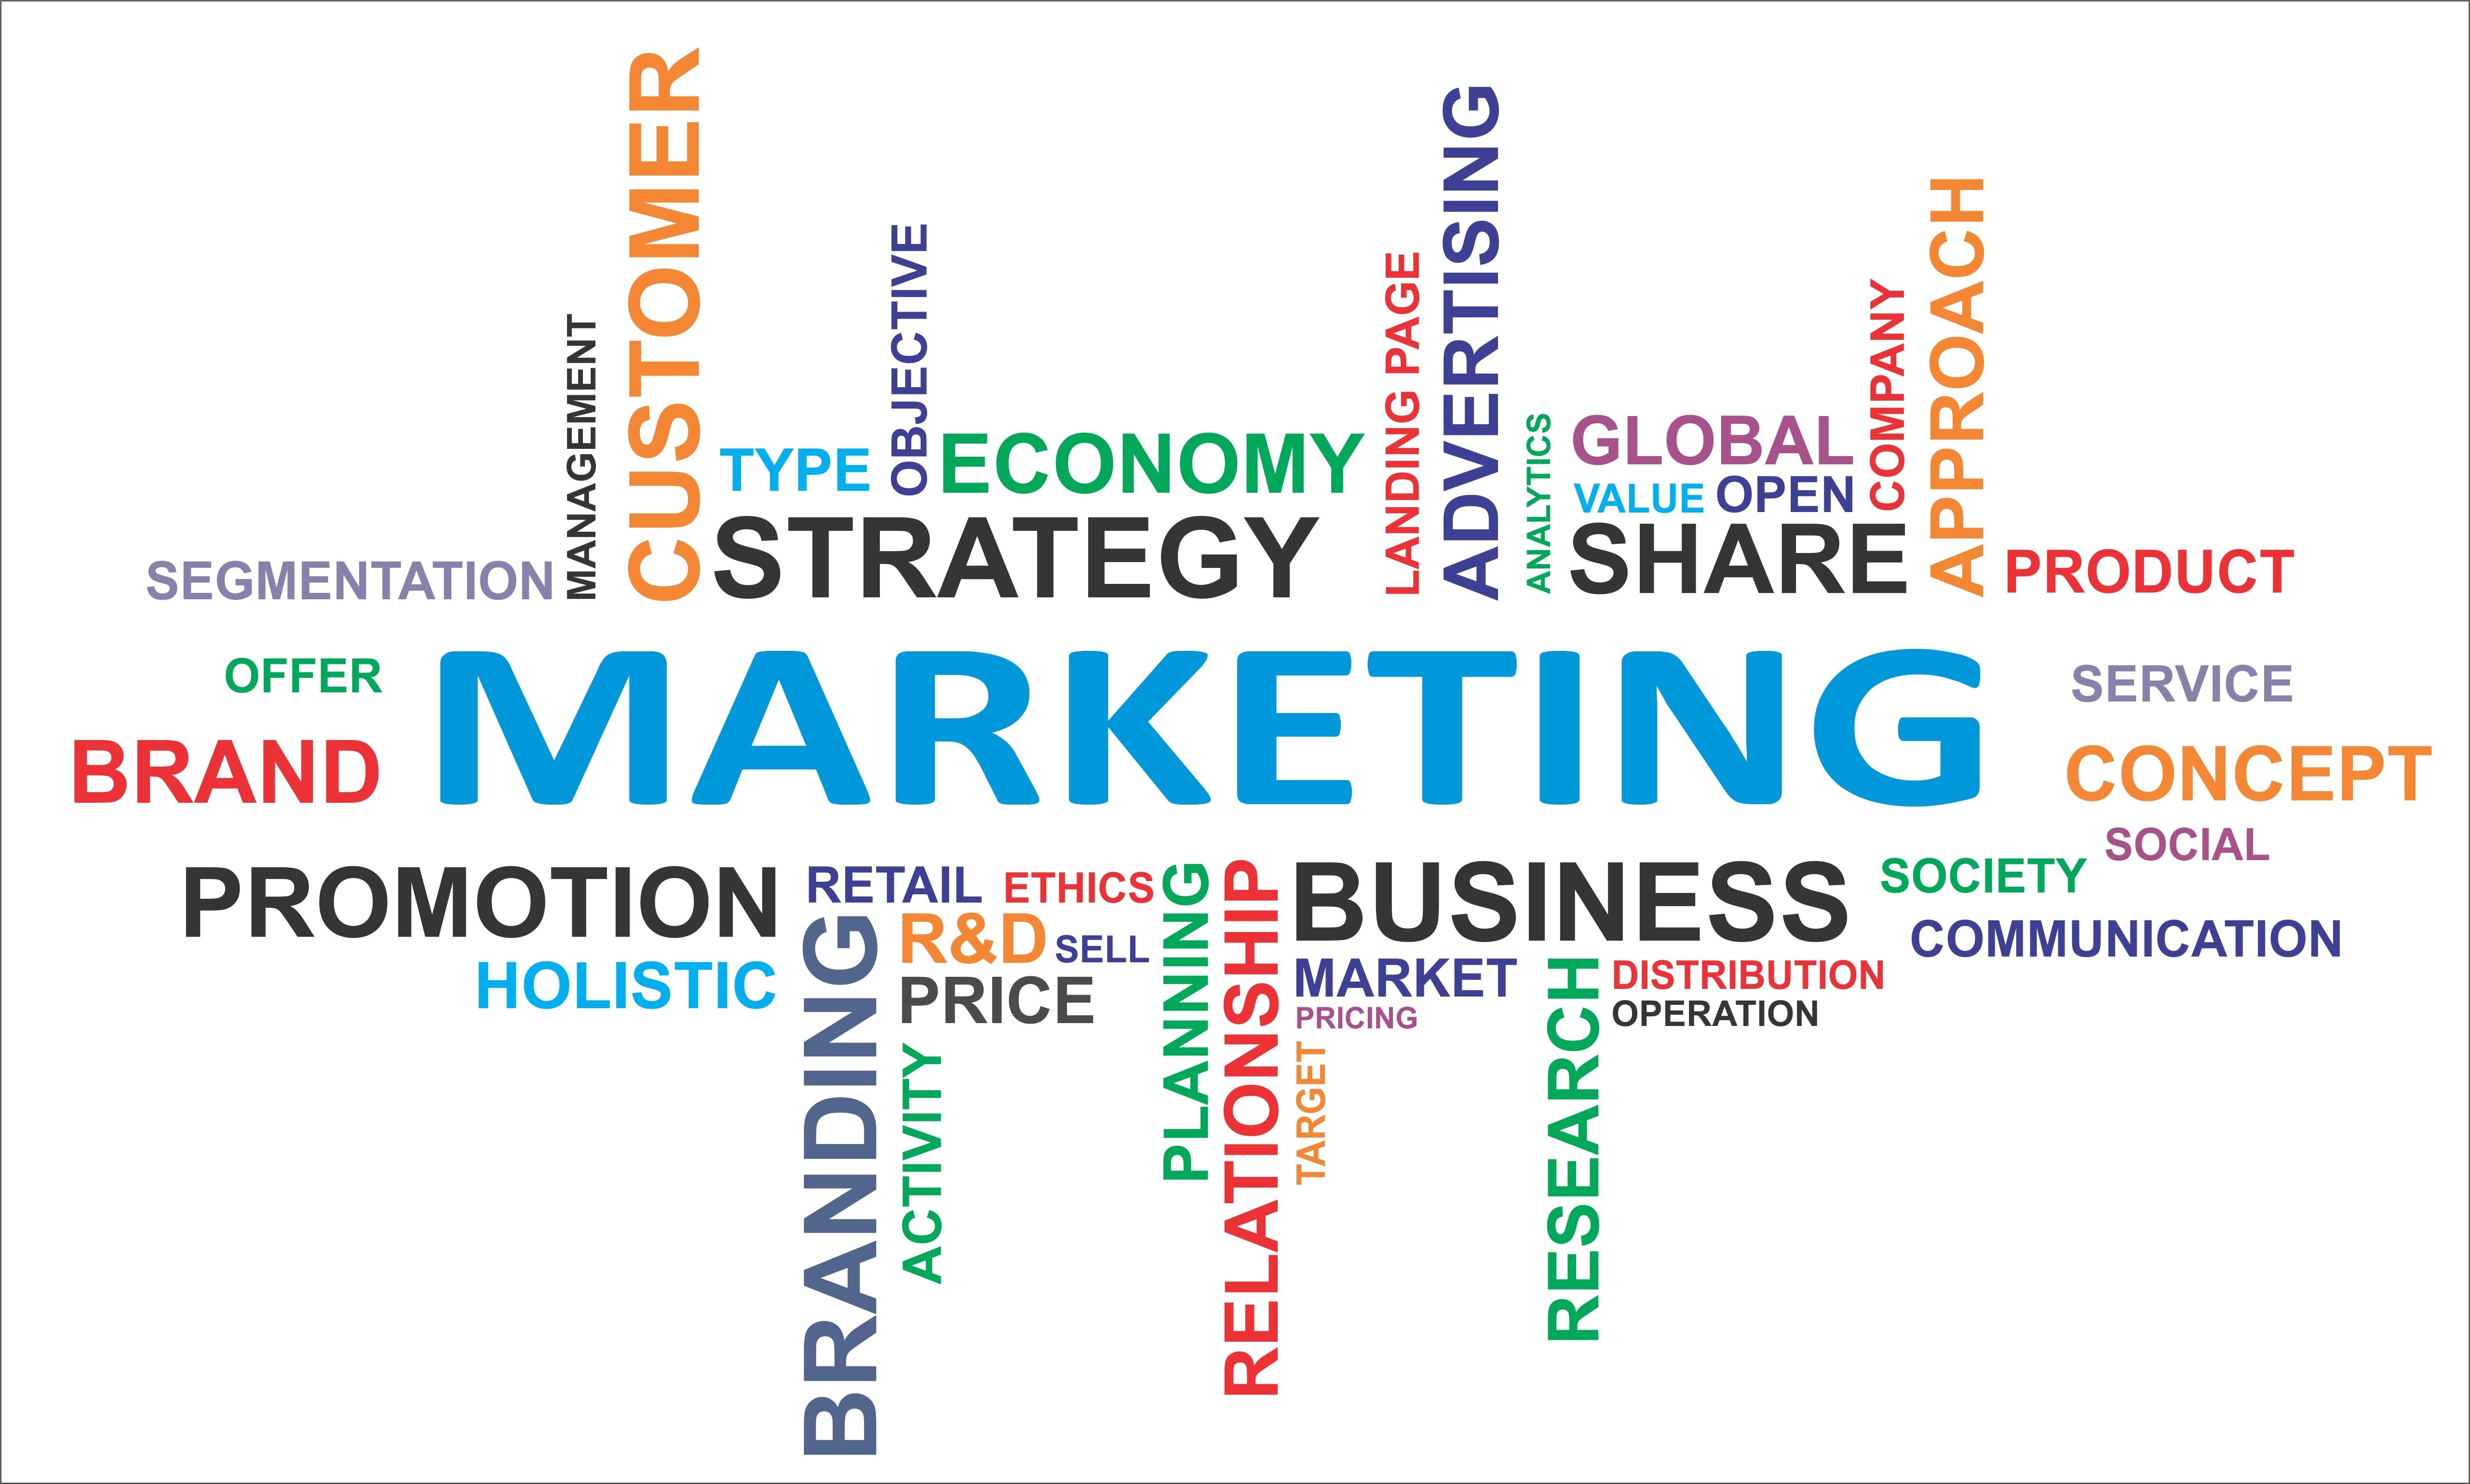 marketing concept and marketing segmentation in practice essay